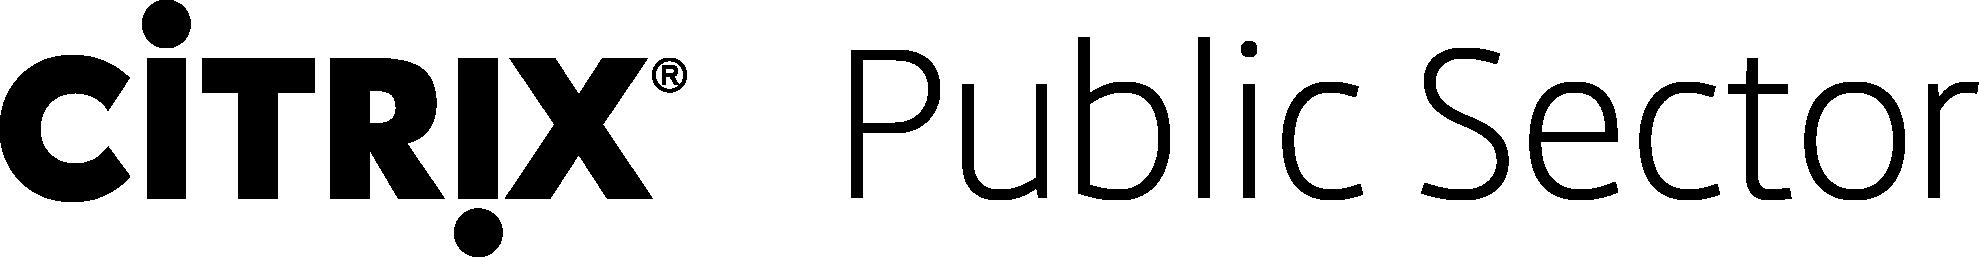 10518_public-sector_promo_logotype_horizontal